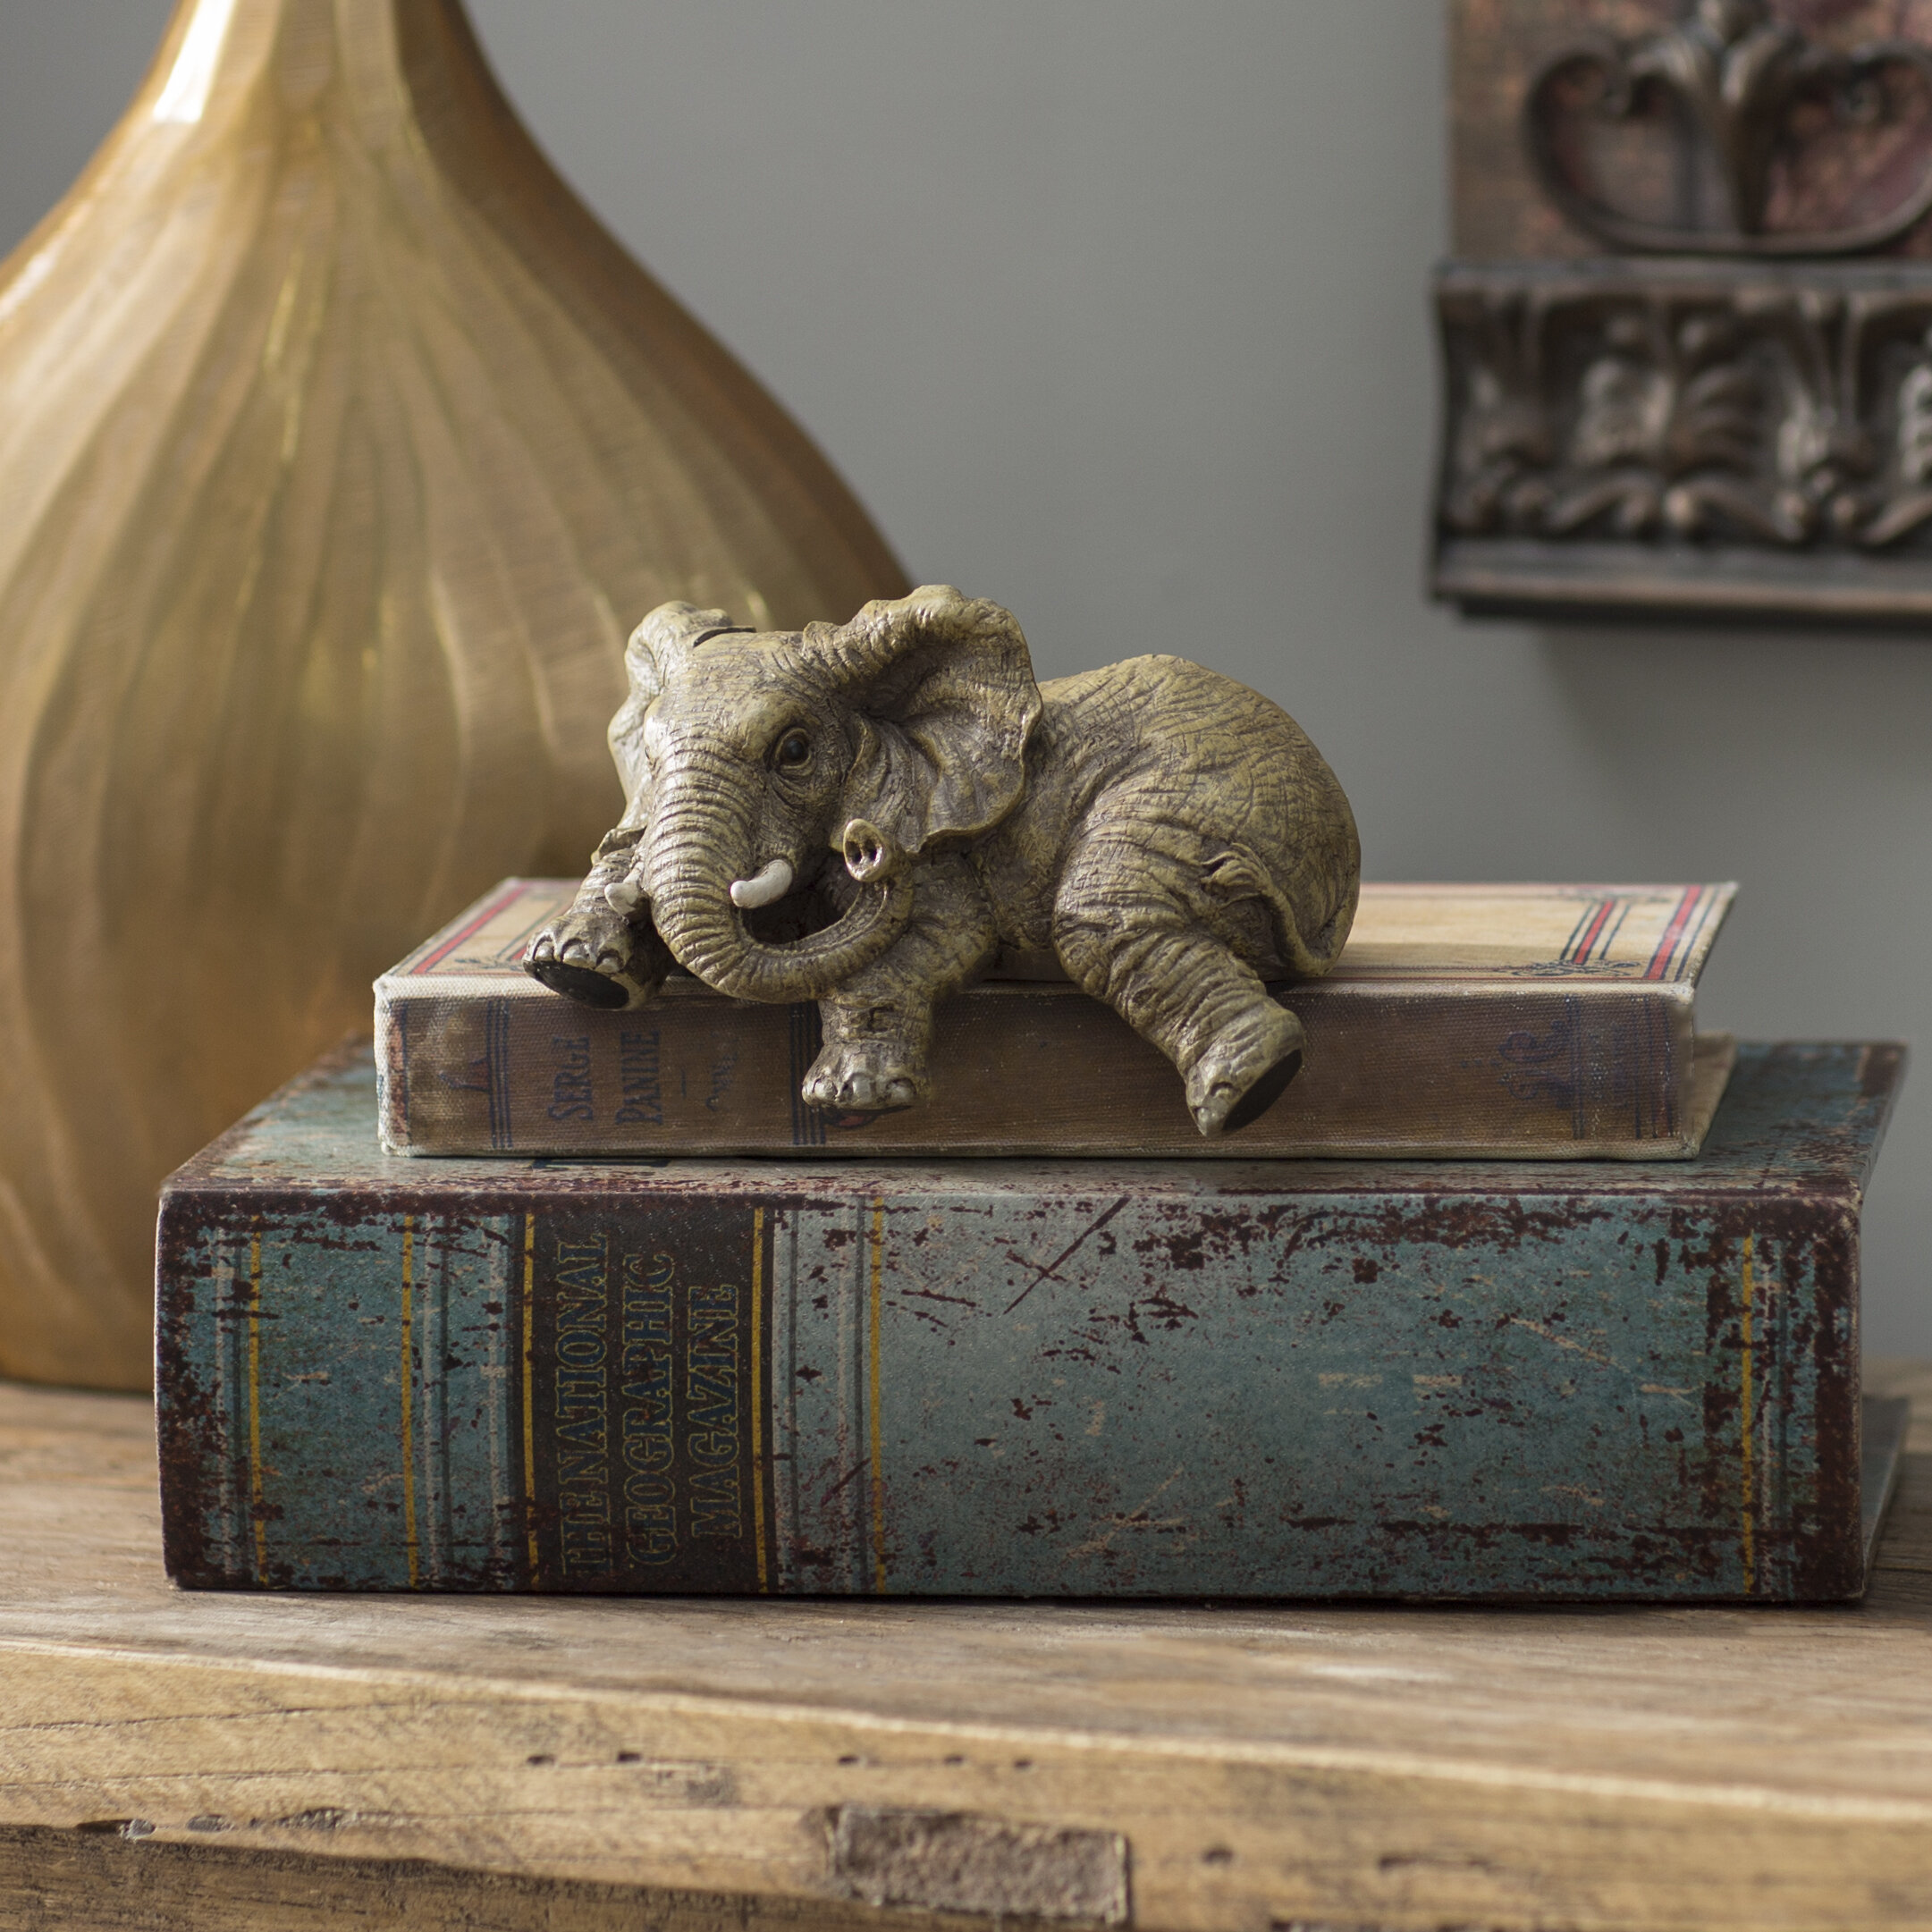 Urban Trends Ceramic Geometric Sitting Cat Head Tilted on The Side Gloss Finish White Figurine